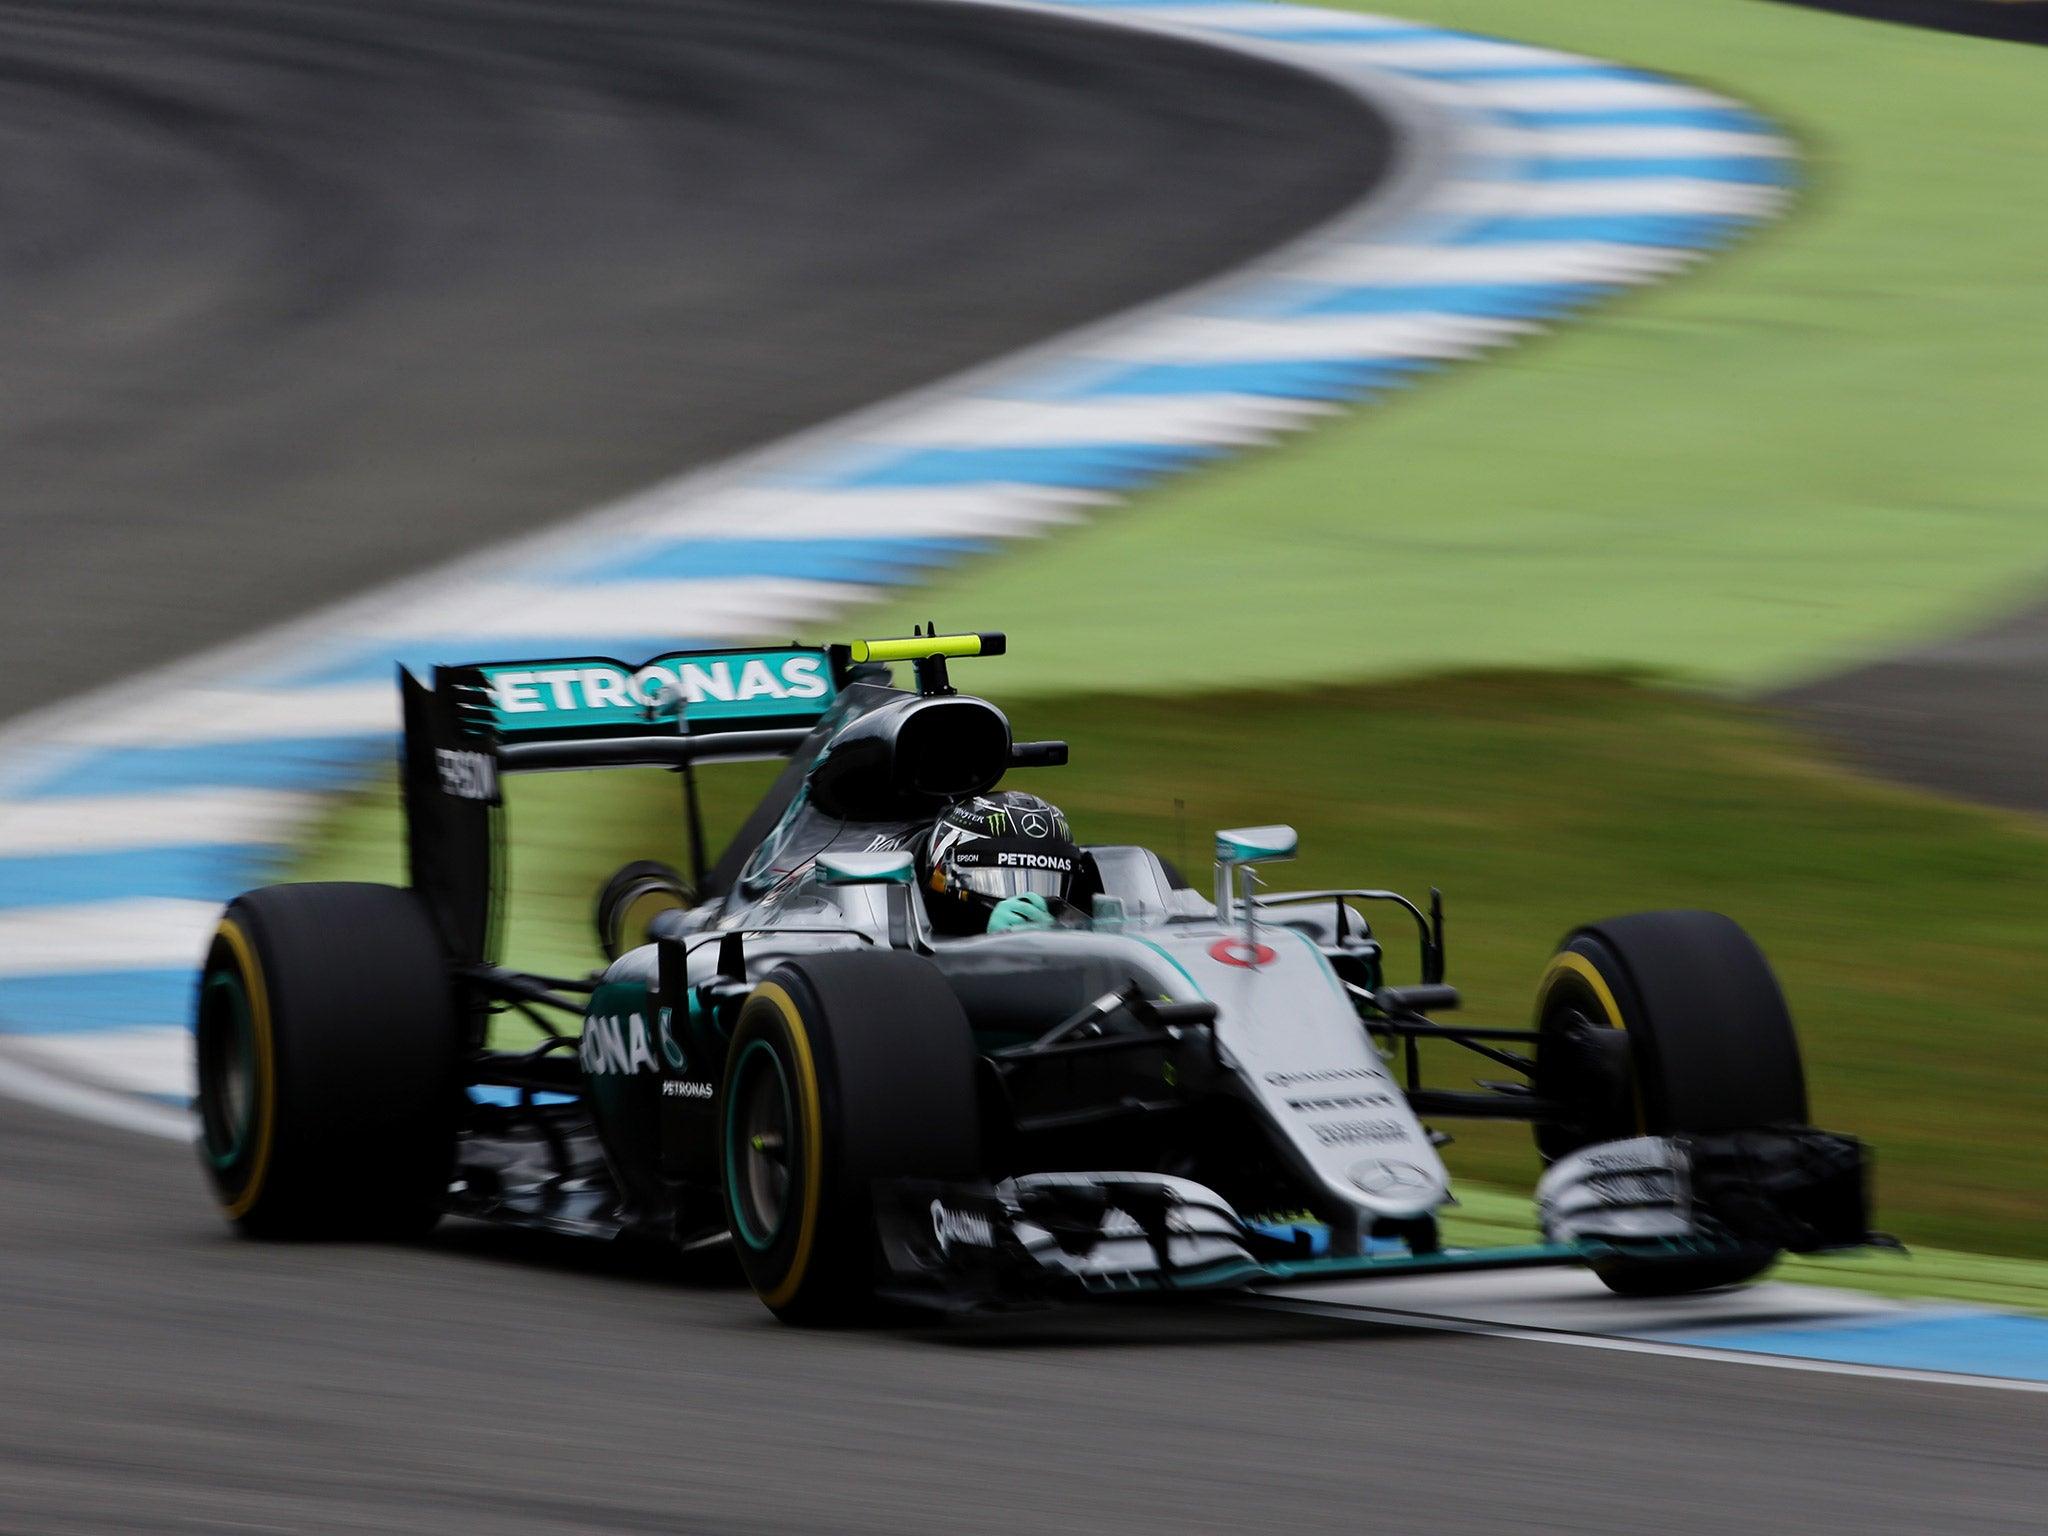 German Grand Prix: Nico Rosberg holds advantage over Lewis Hamilton